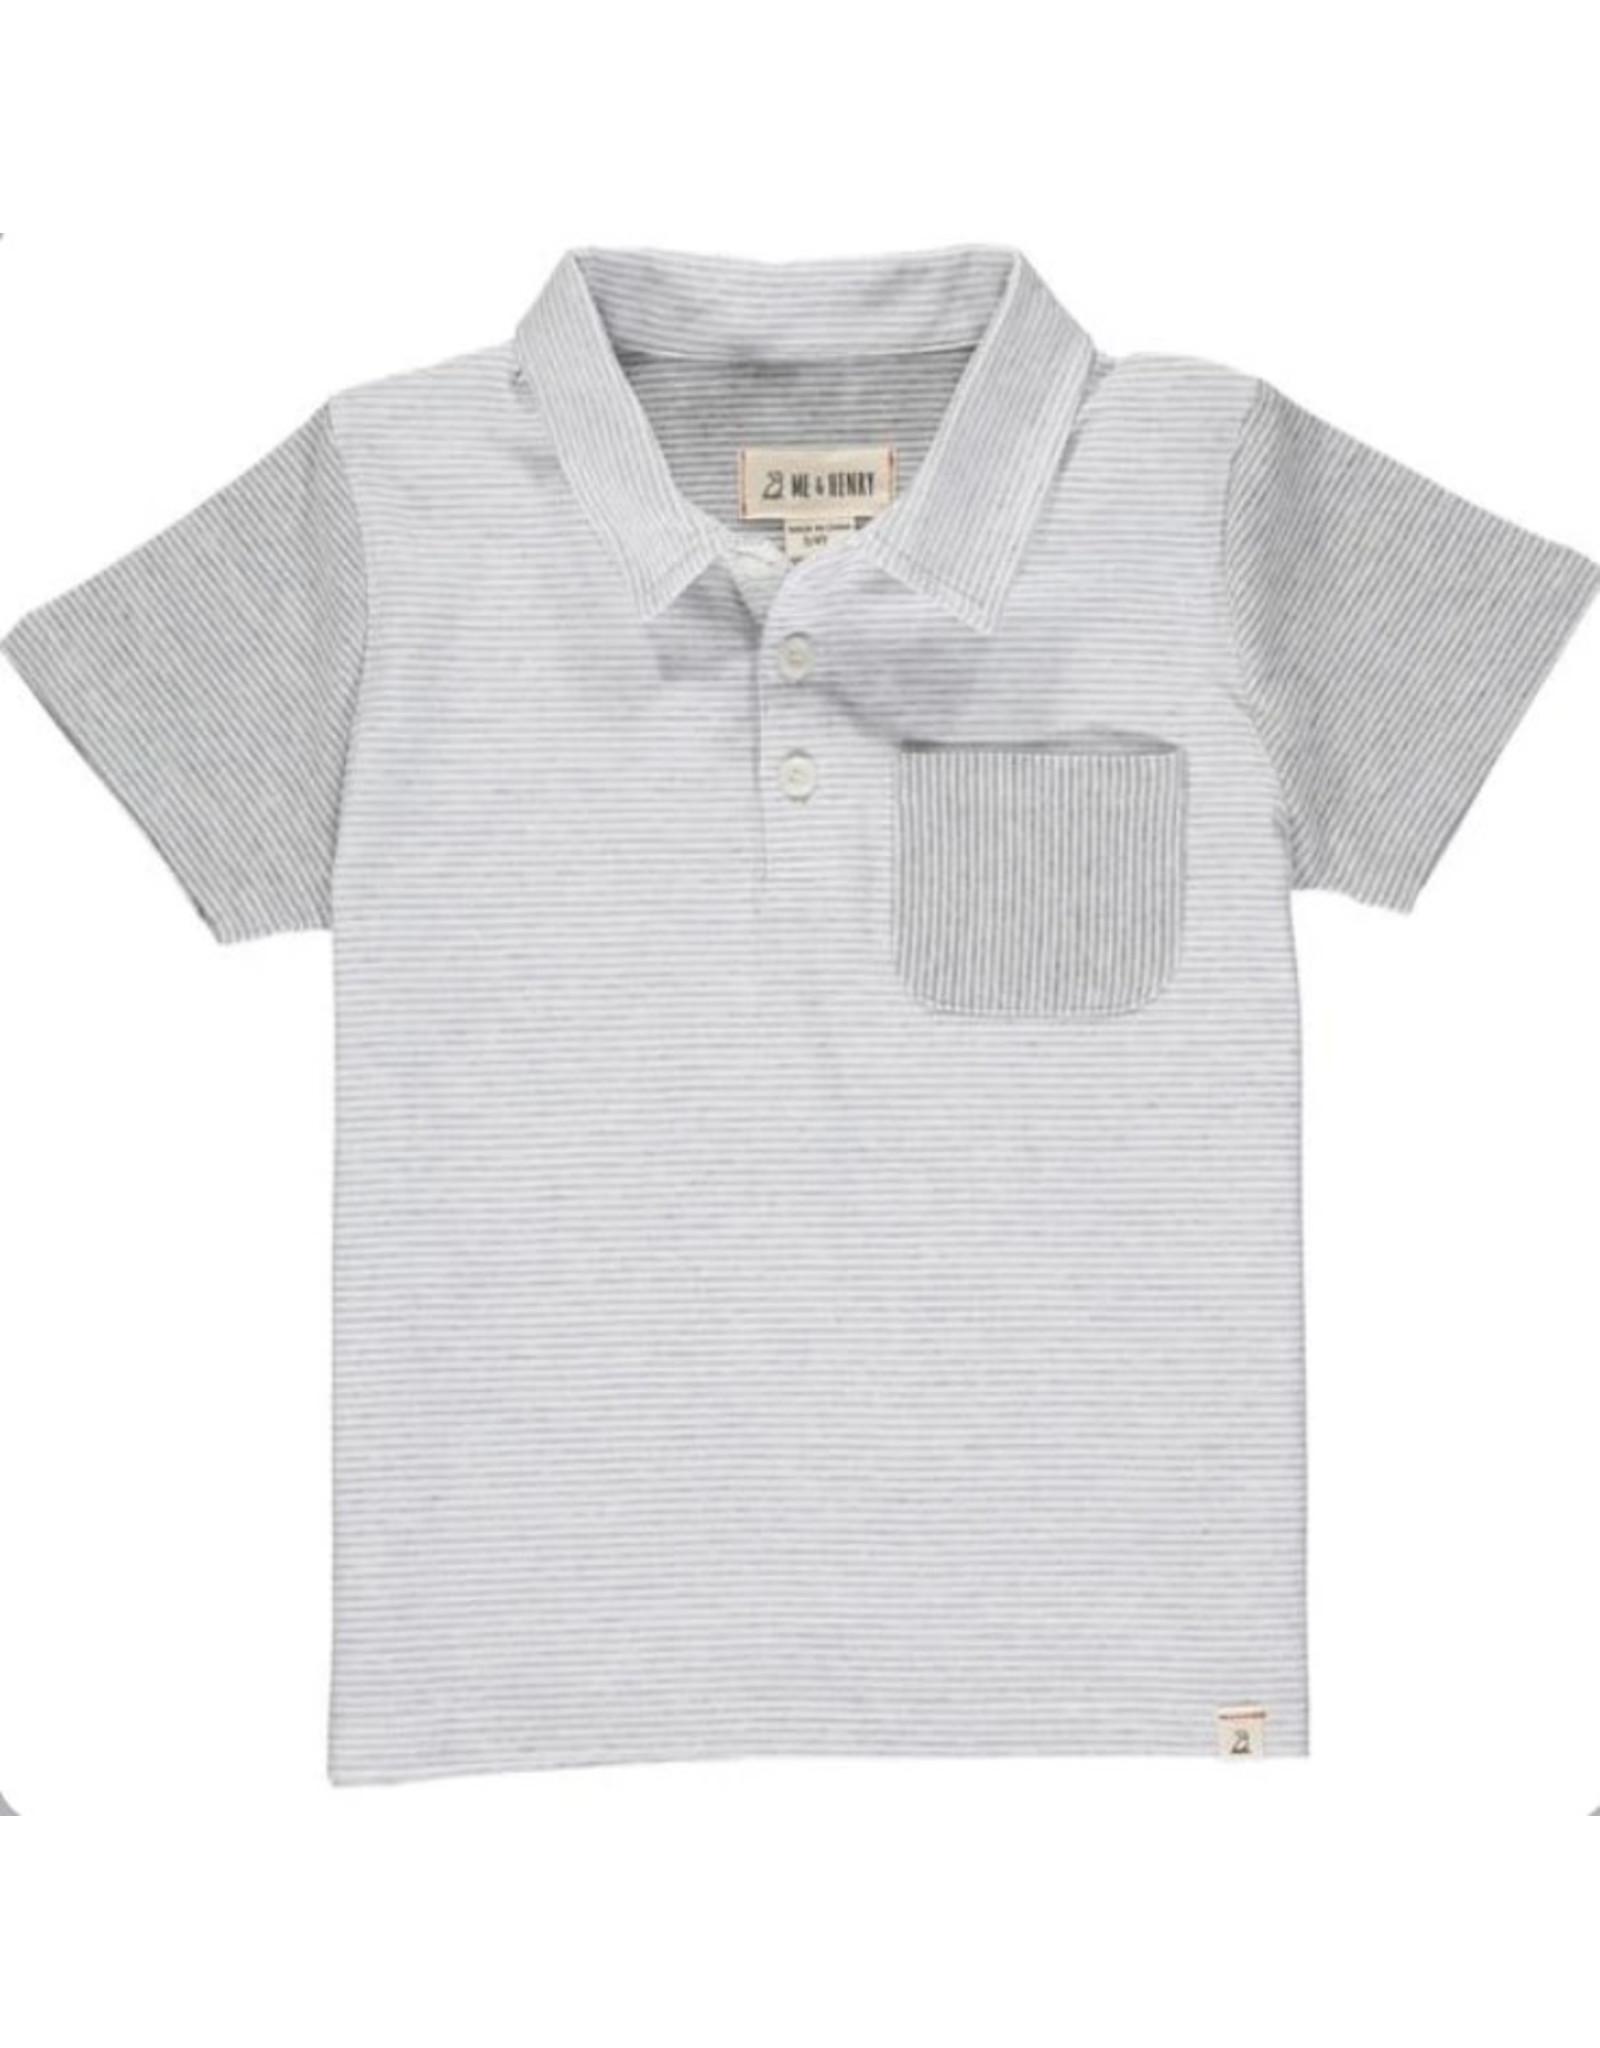 Me & Henry Me & Henry - Grey/White Micro Stripe Polo